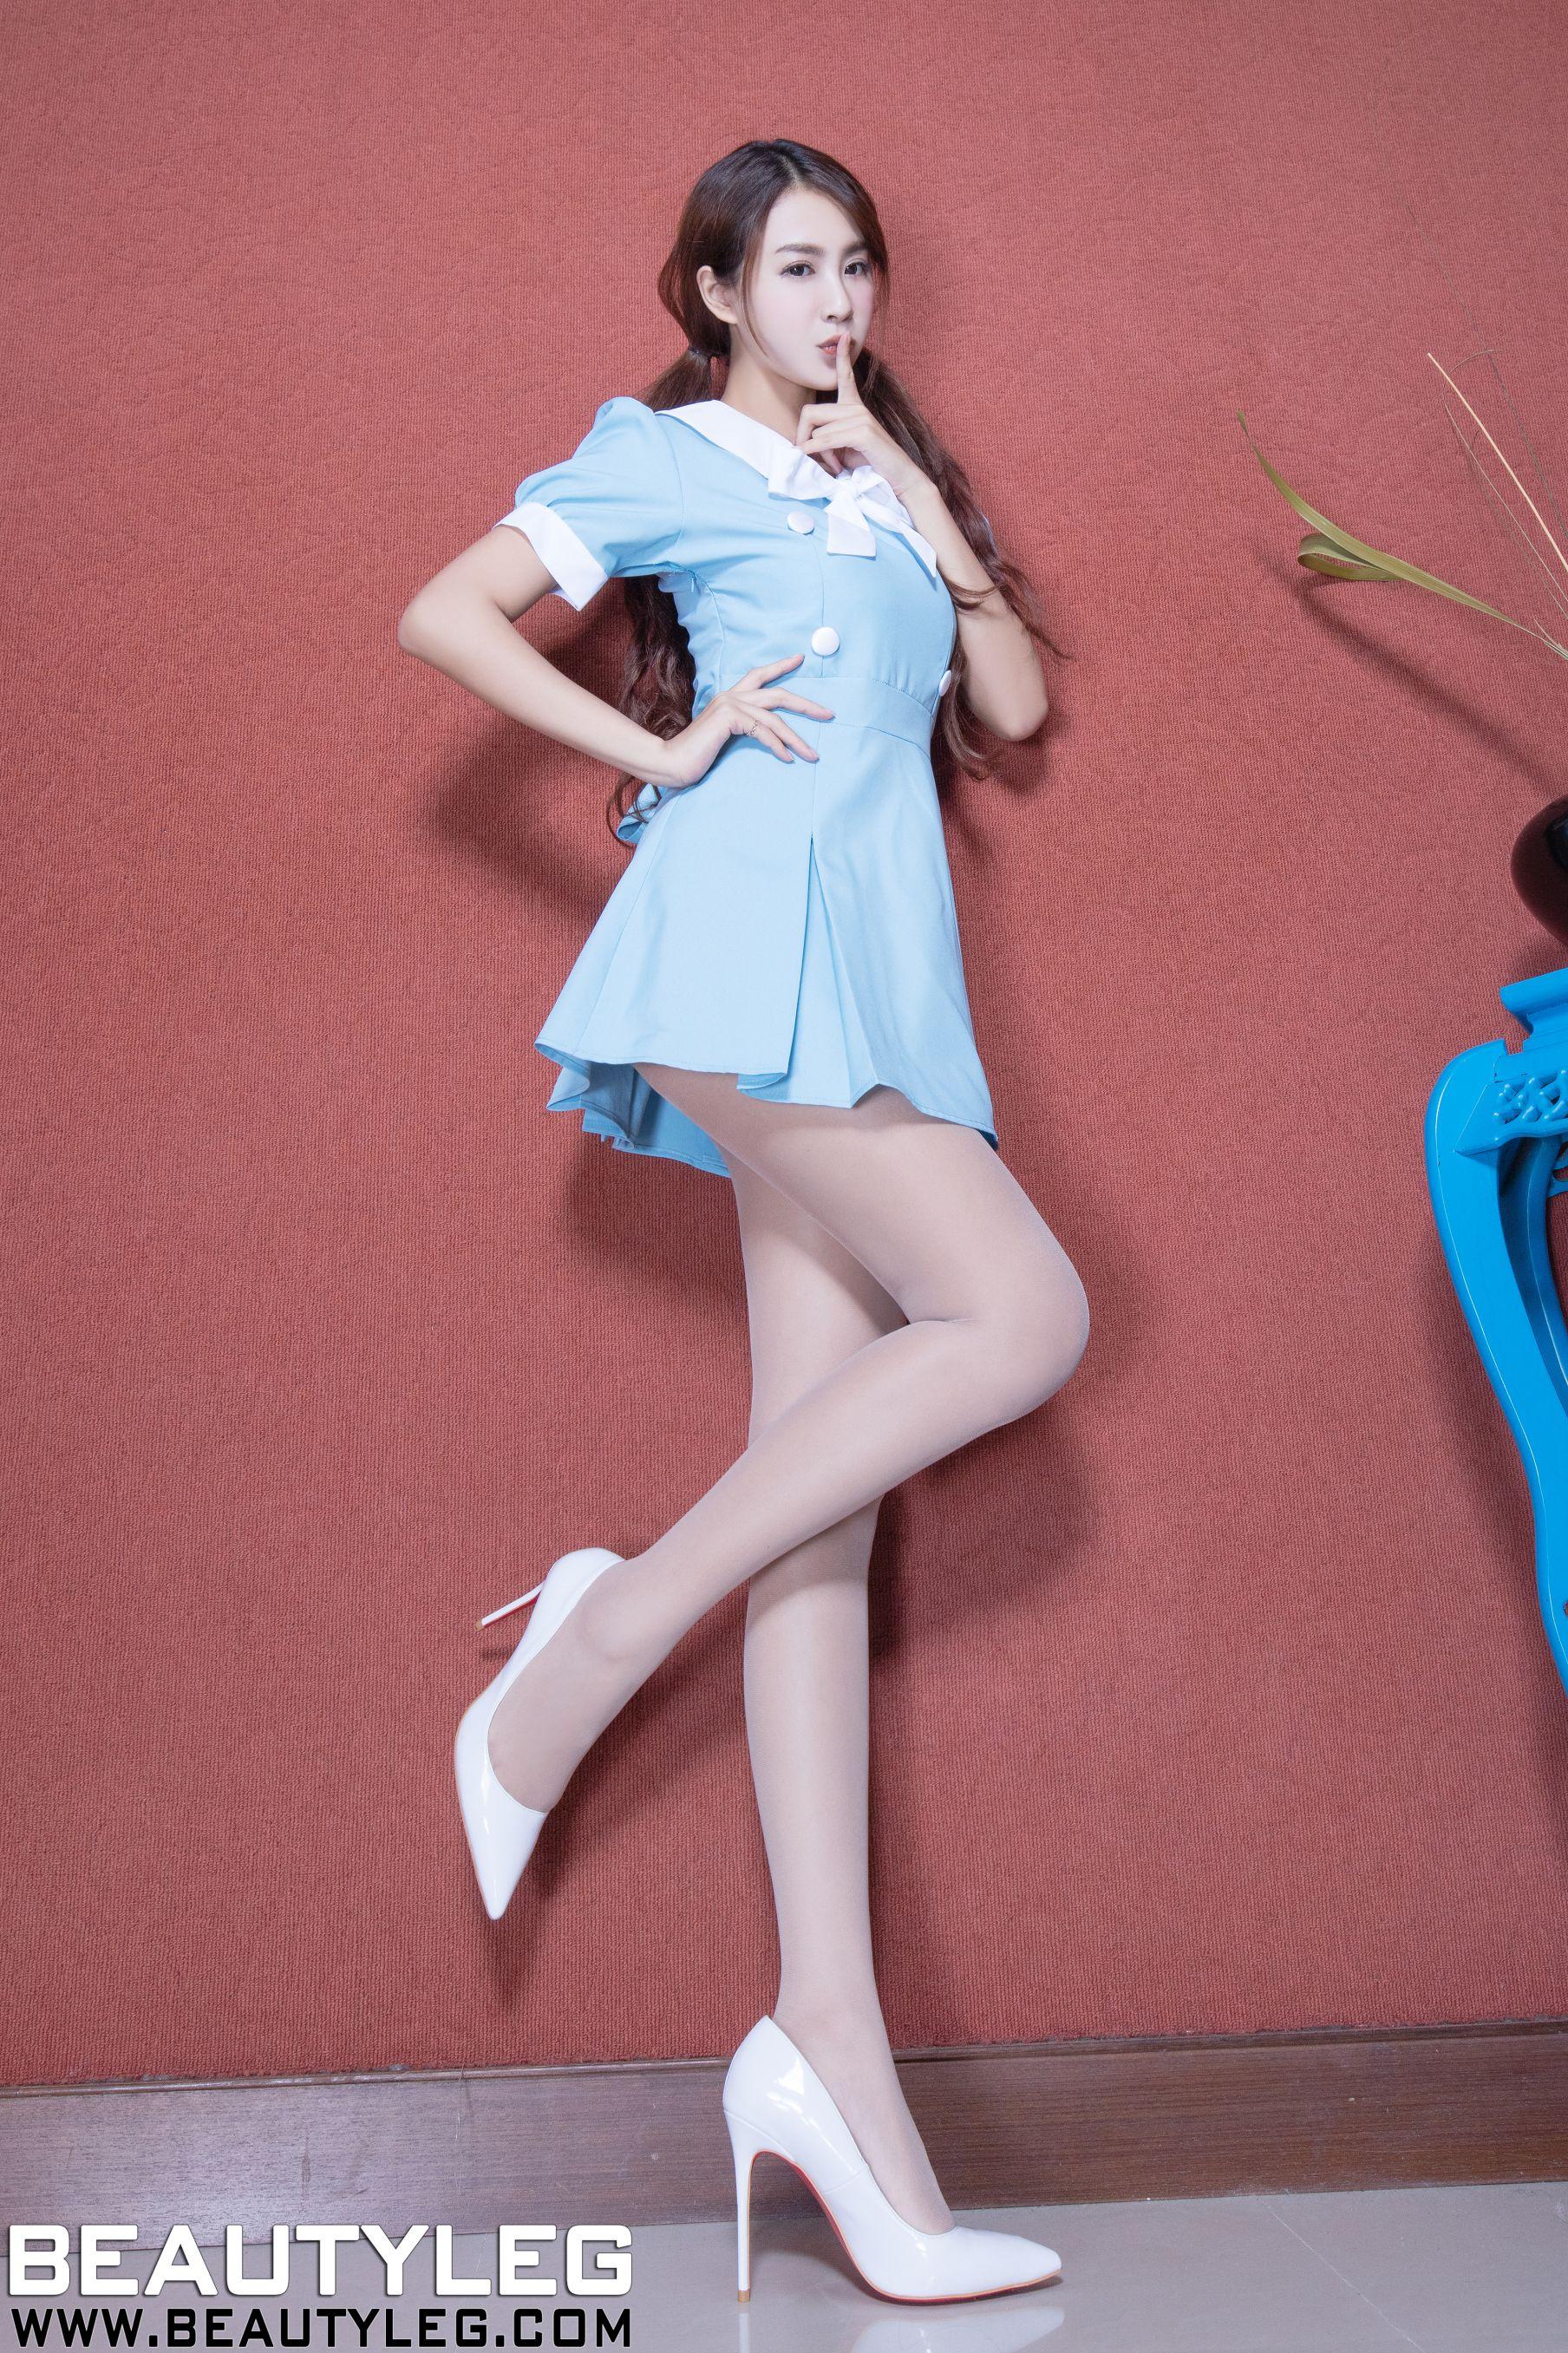 VOL.1033 [Beautyleg]高跟美腿:夏晴(夏晴Miso,腿模Miso)高品质写真套图(39P)